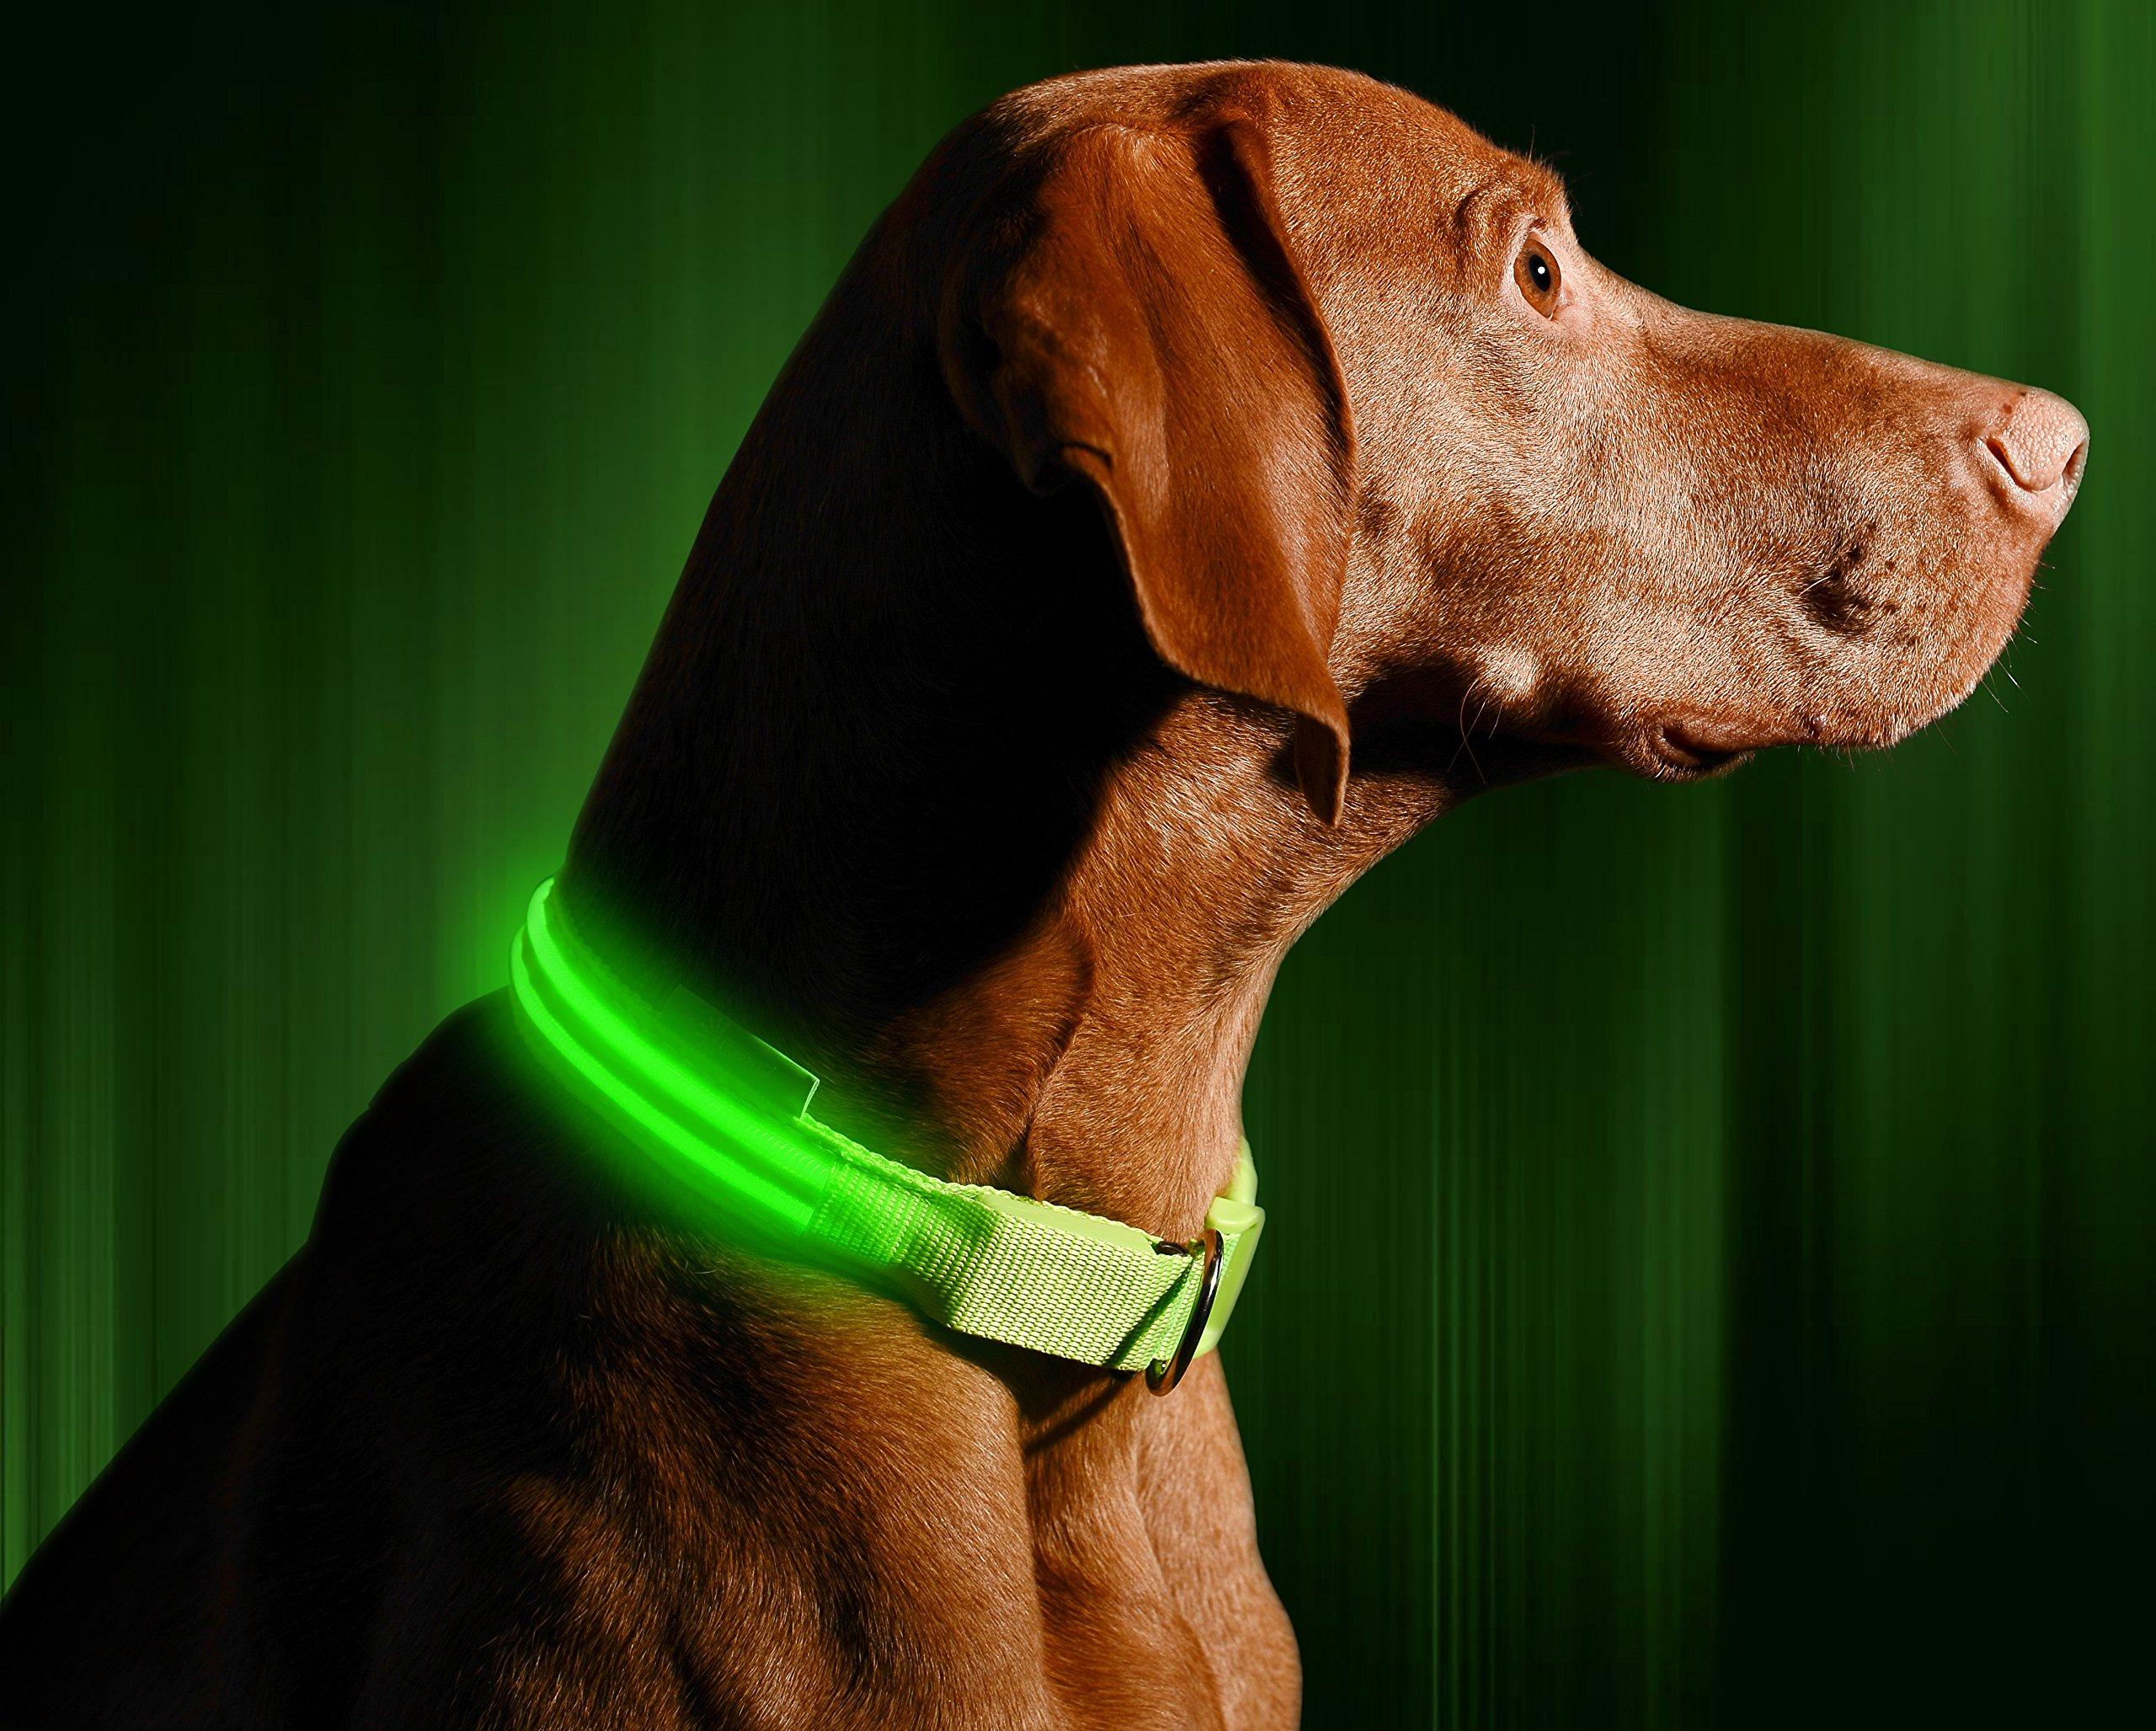 Illumiseen LED Dog Collar USB Rechargeable Neon Green